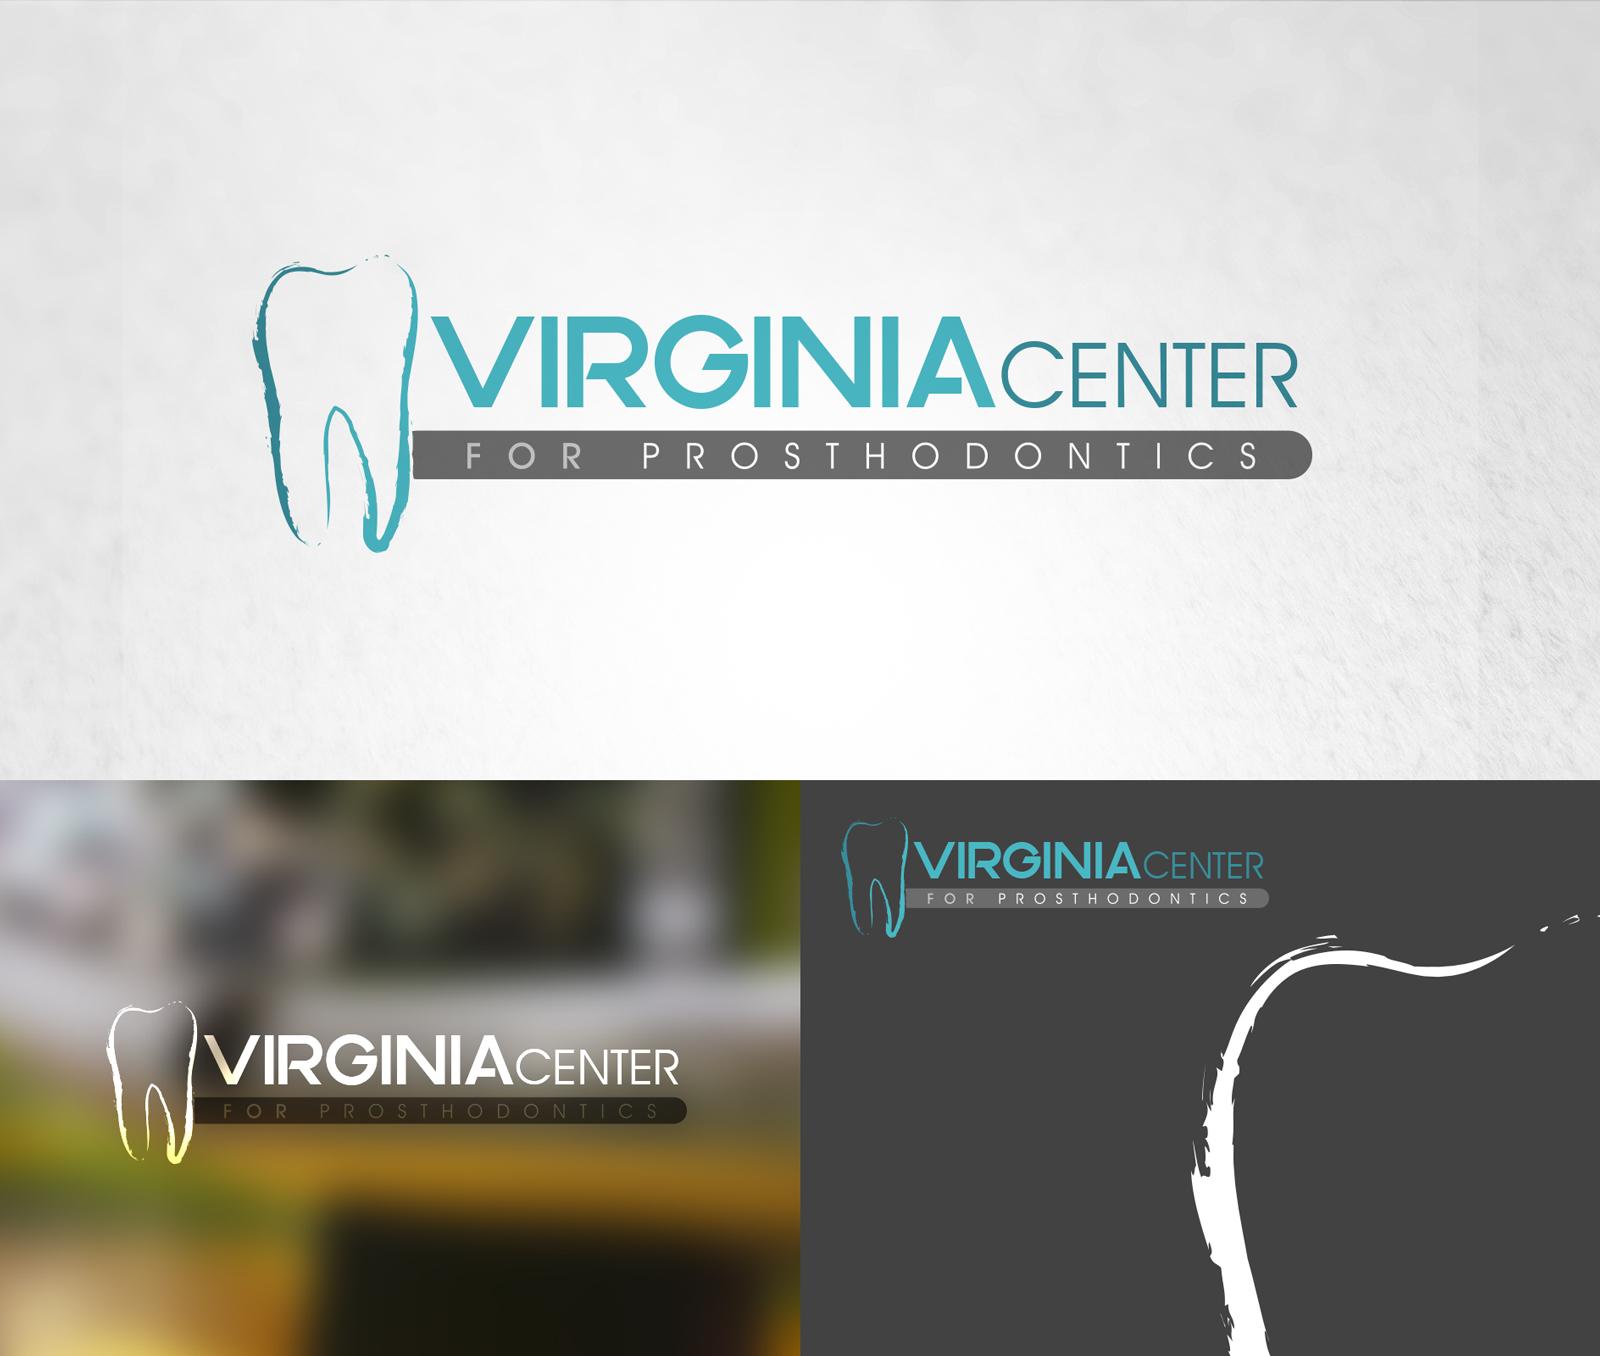 Logo Design by Mostafa Hegazy - Entry No. 29 in the Logo Design Contest Imaginative Logo Design for Virginia Center for Prosthodontics.